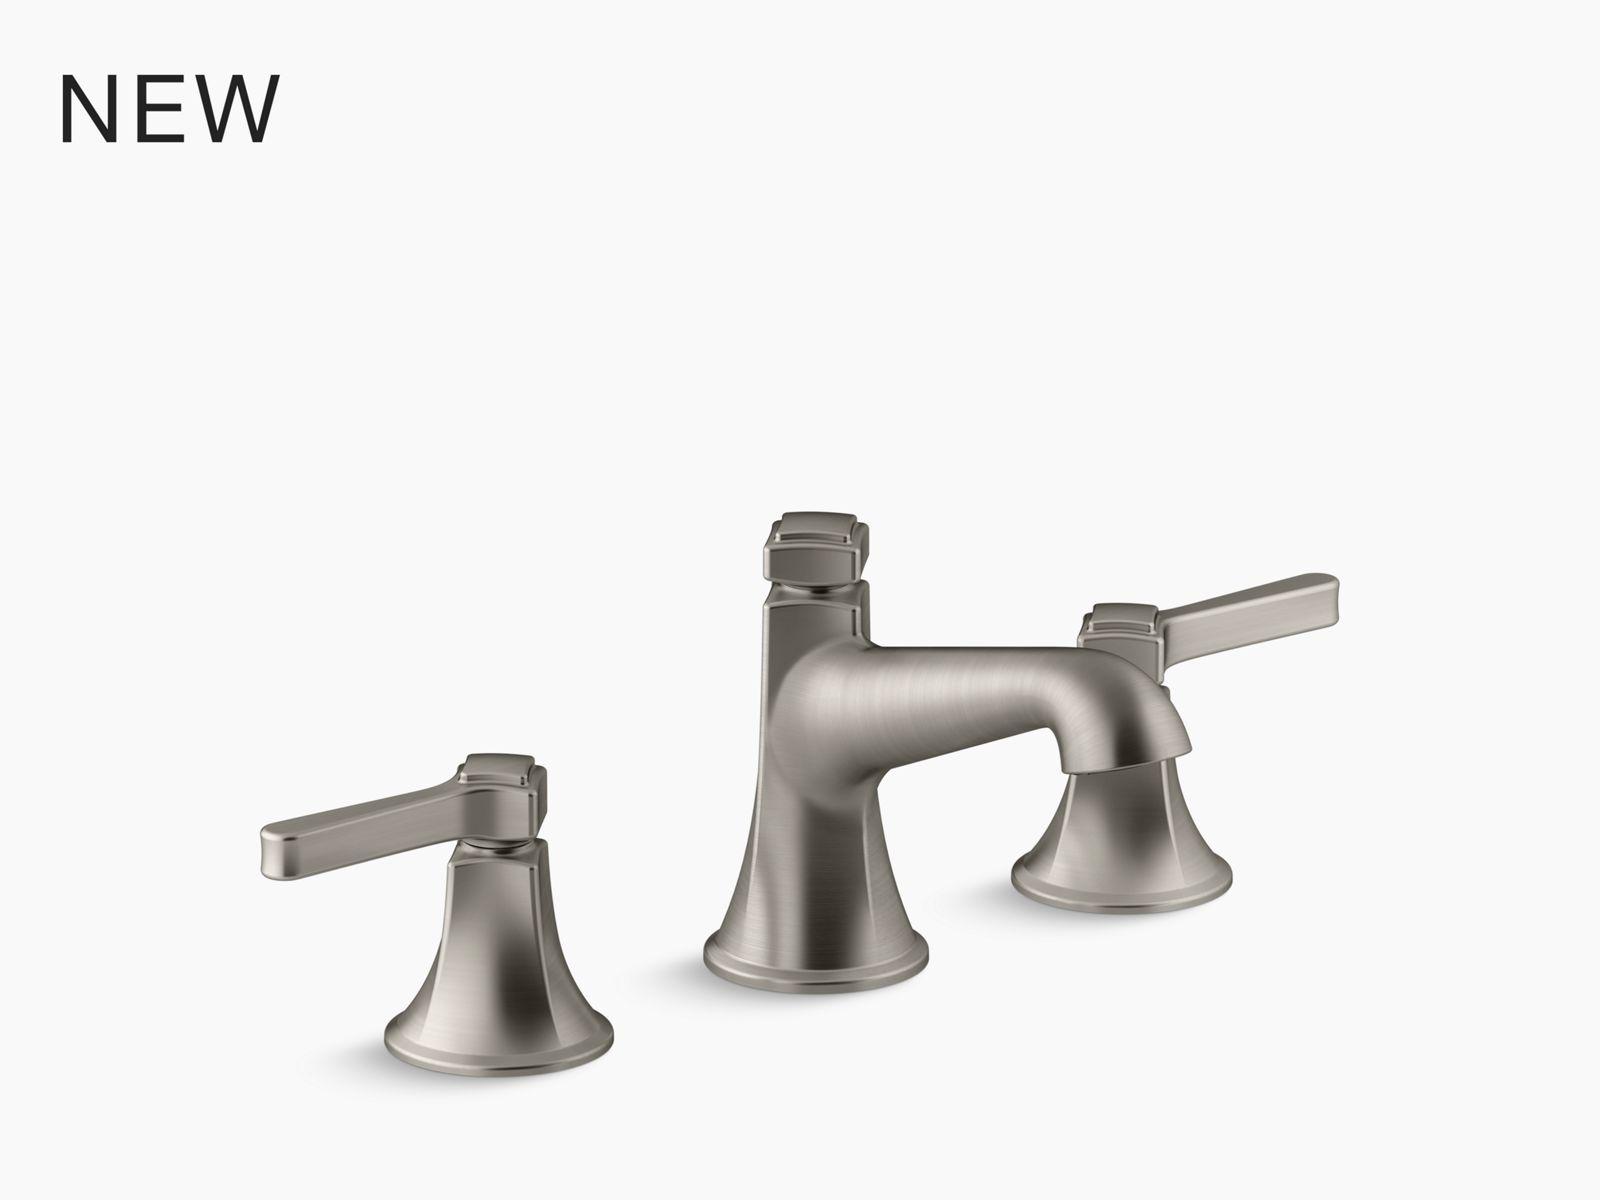 venza single handle bathroom sink faucet with lever handle